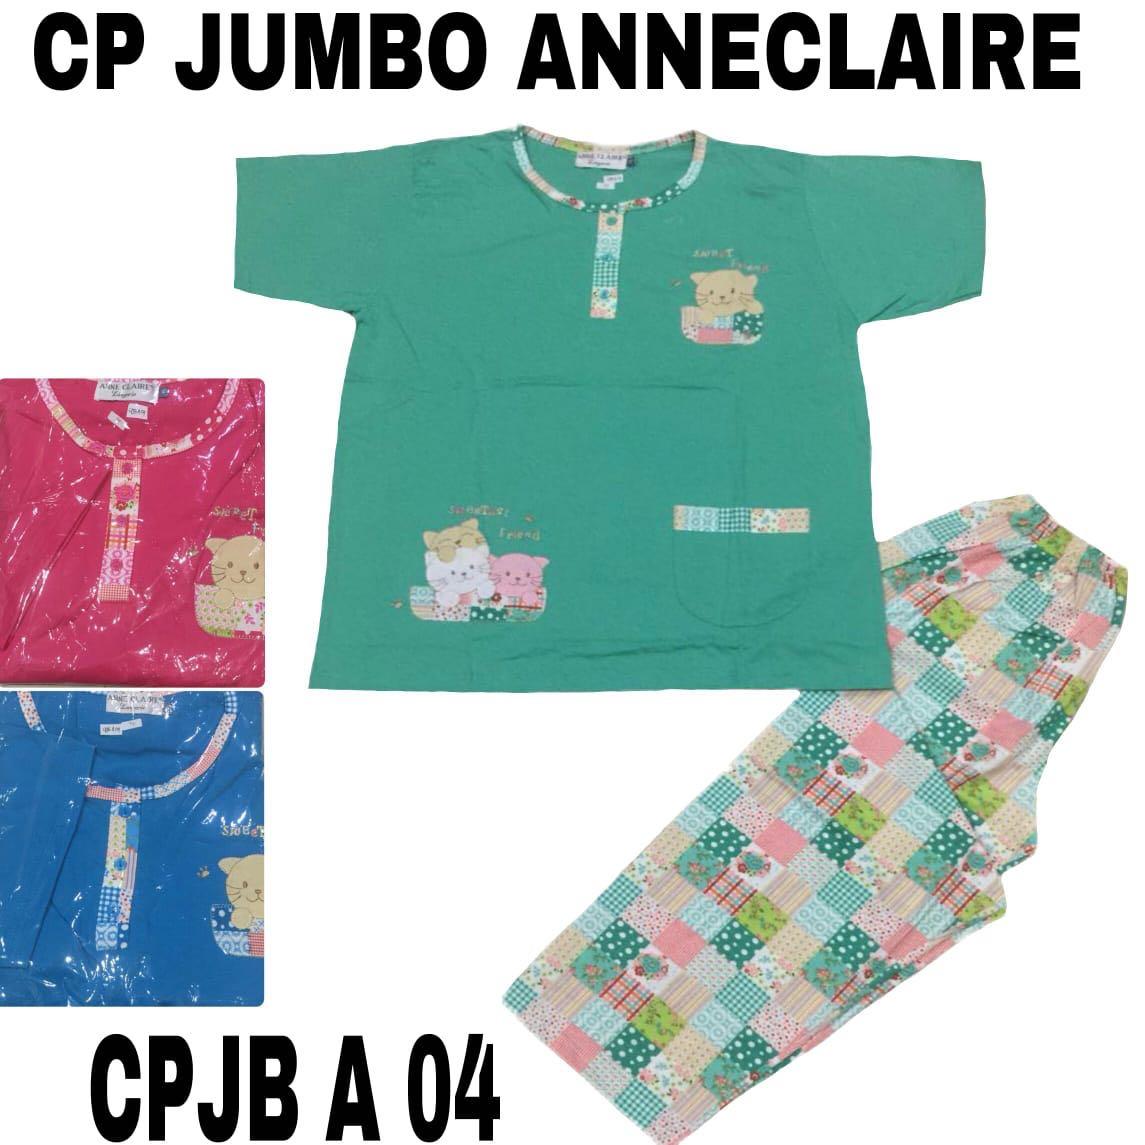 Jual Baju Tidur Anneclaire jumbo CPJB A 04 Harga Murah